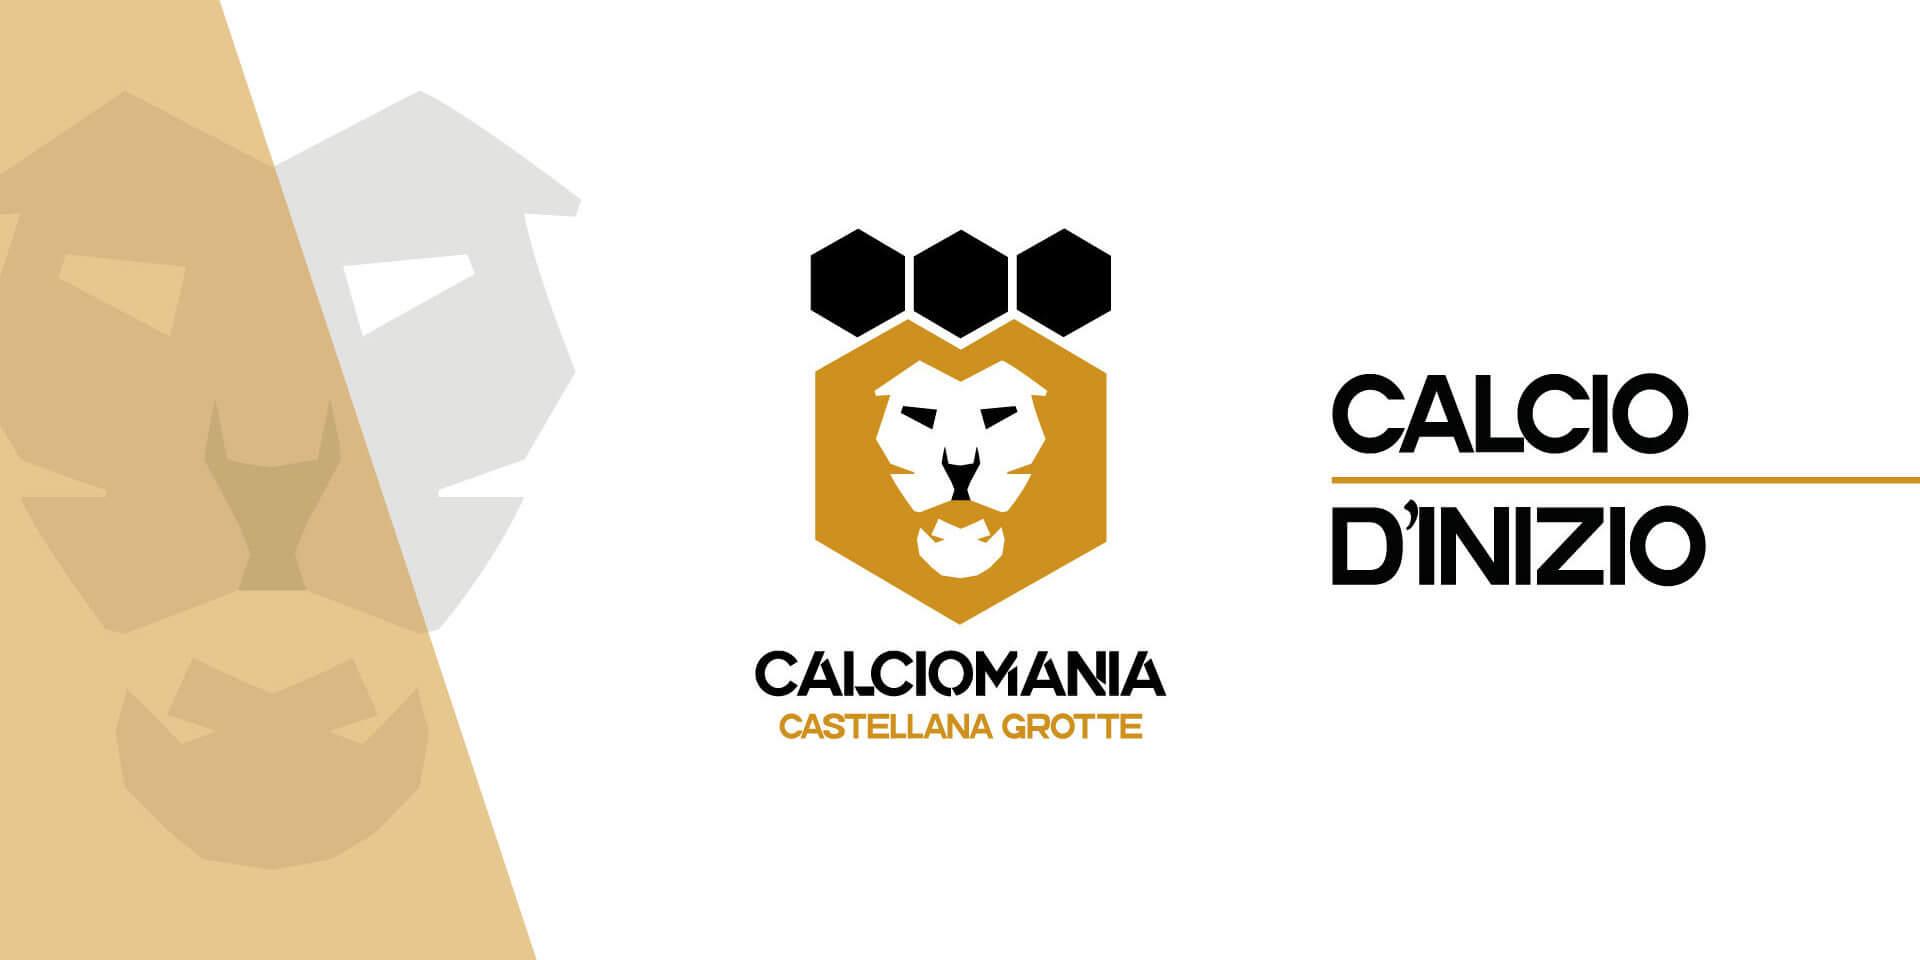 Creazione siti web Associazioni Sportive: Calciomania - Maingage, Web agency Bari